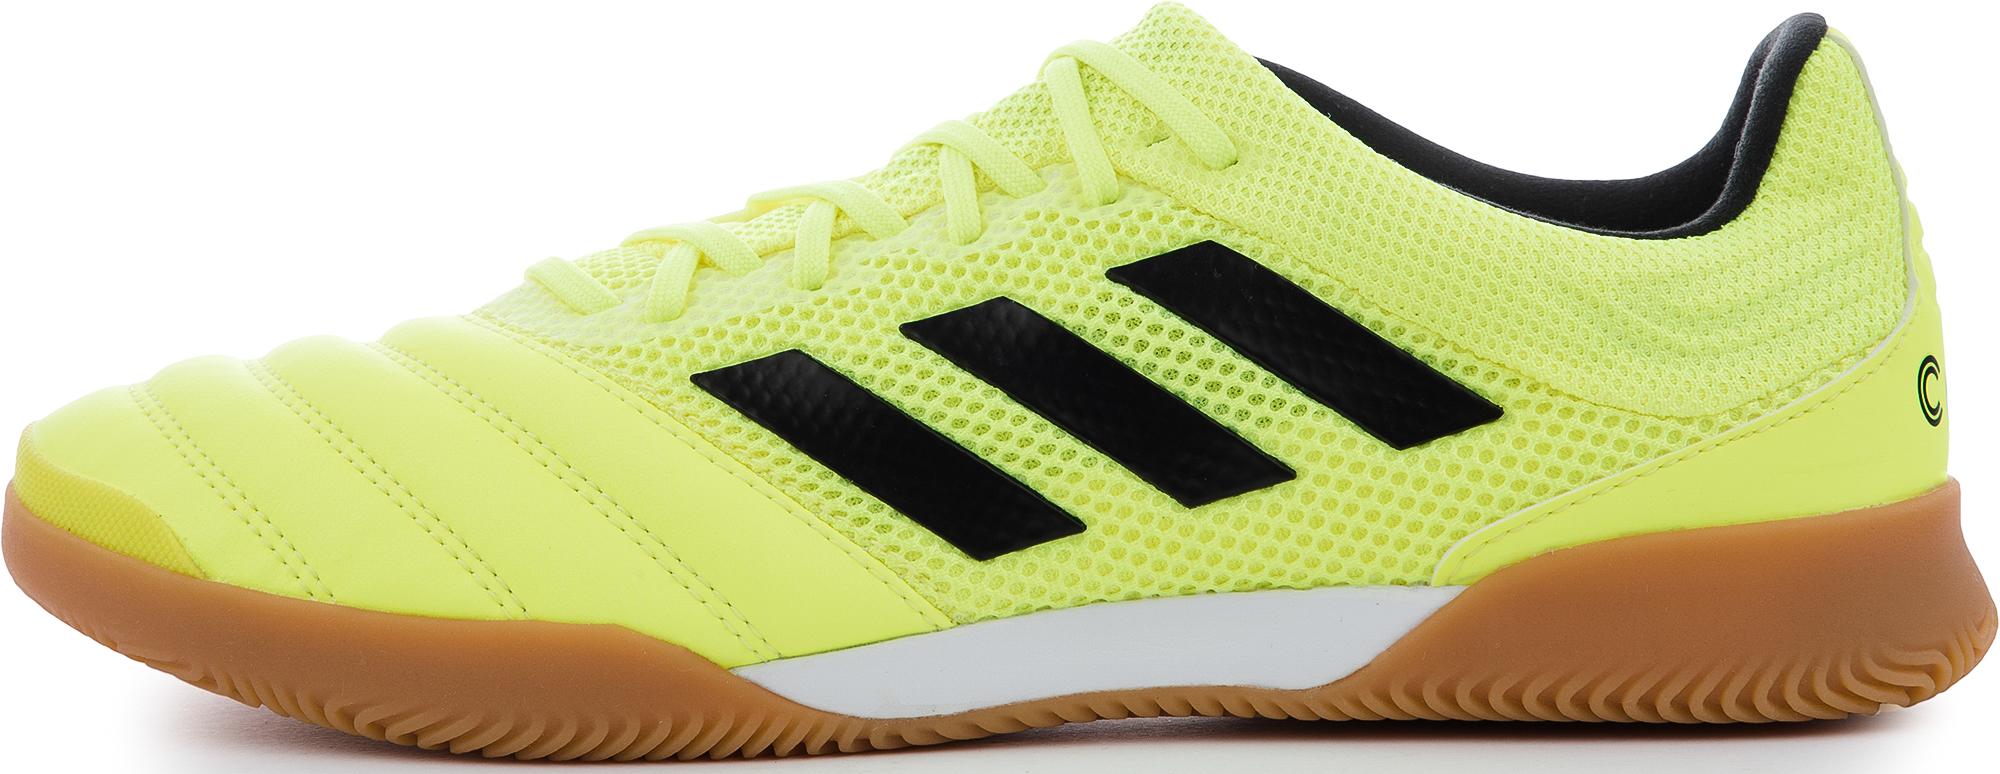 Adidas Бутсы мужские Adidas Copa 19.3 IN Sala, размер 44,5